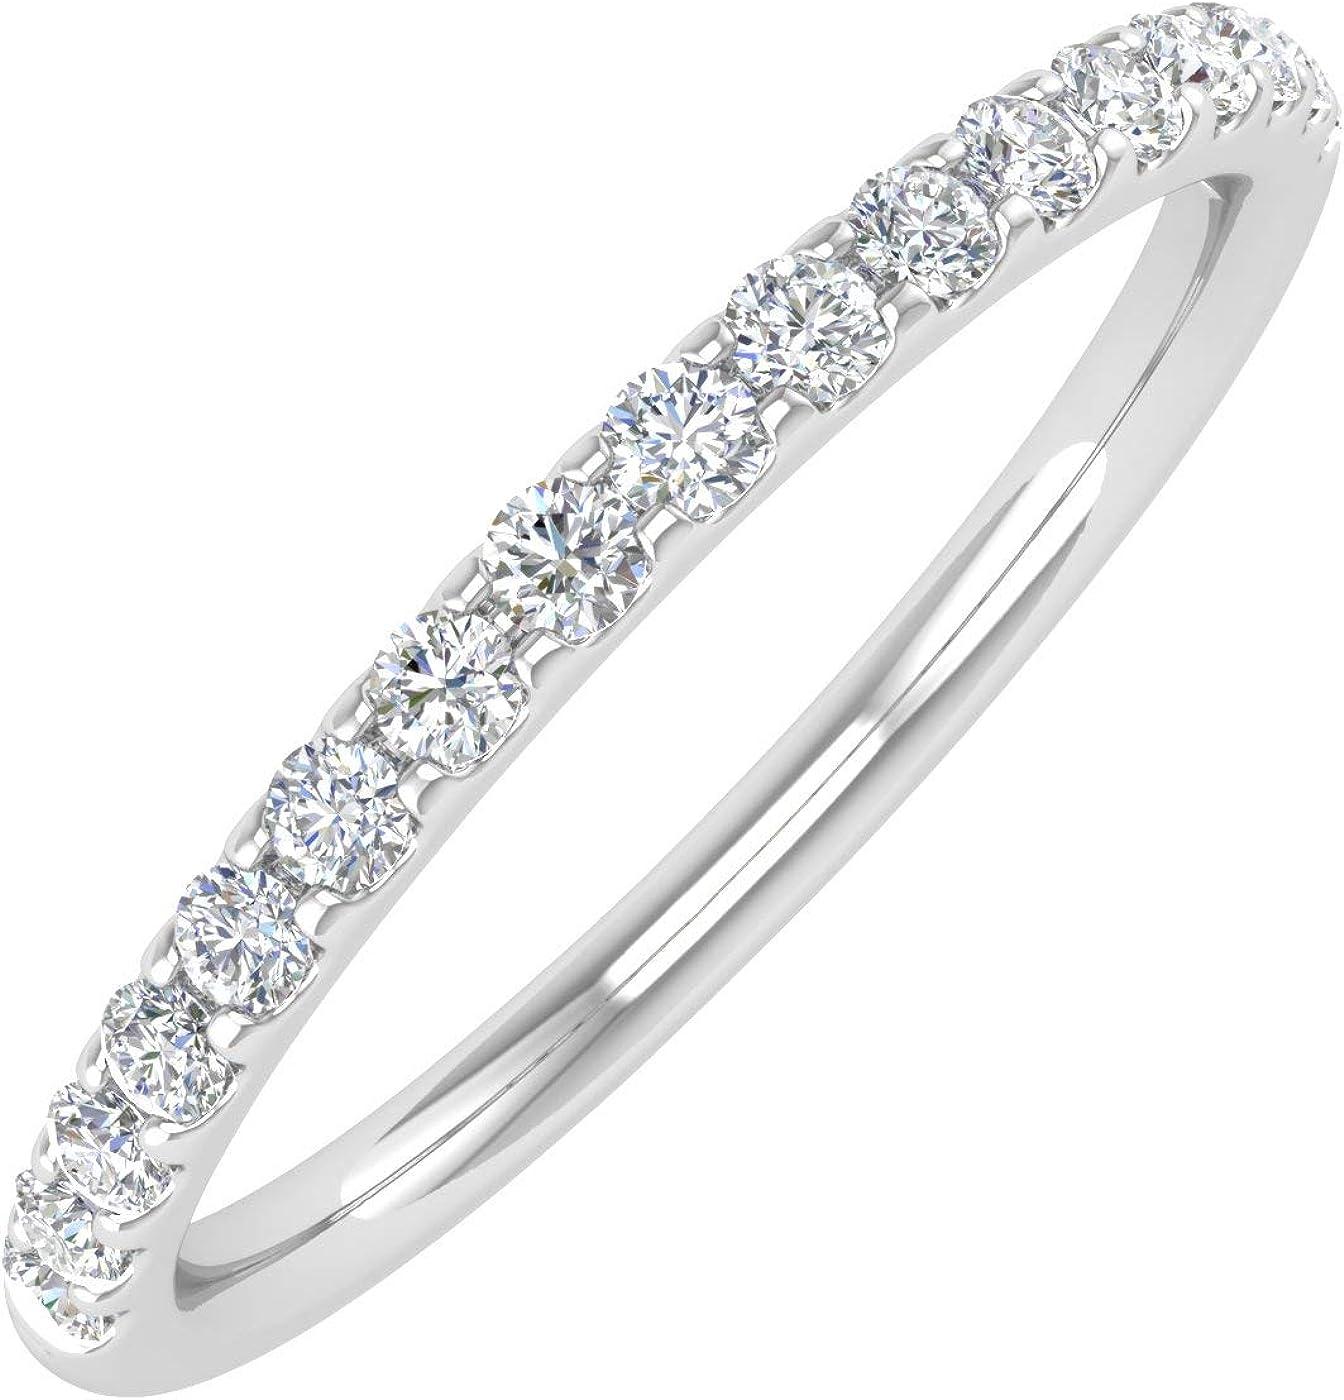 1/4 Carat Diamond Womens Wedding Band in 14K Gold